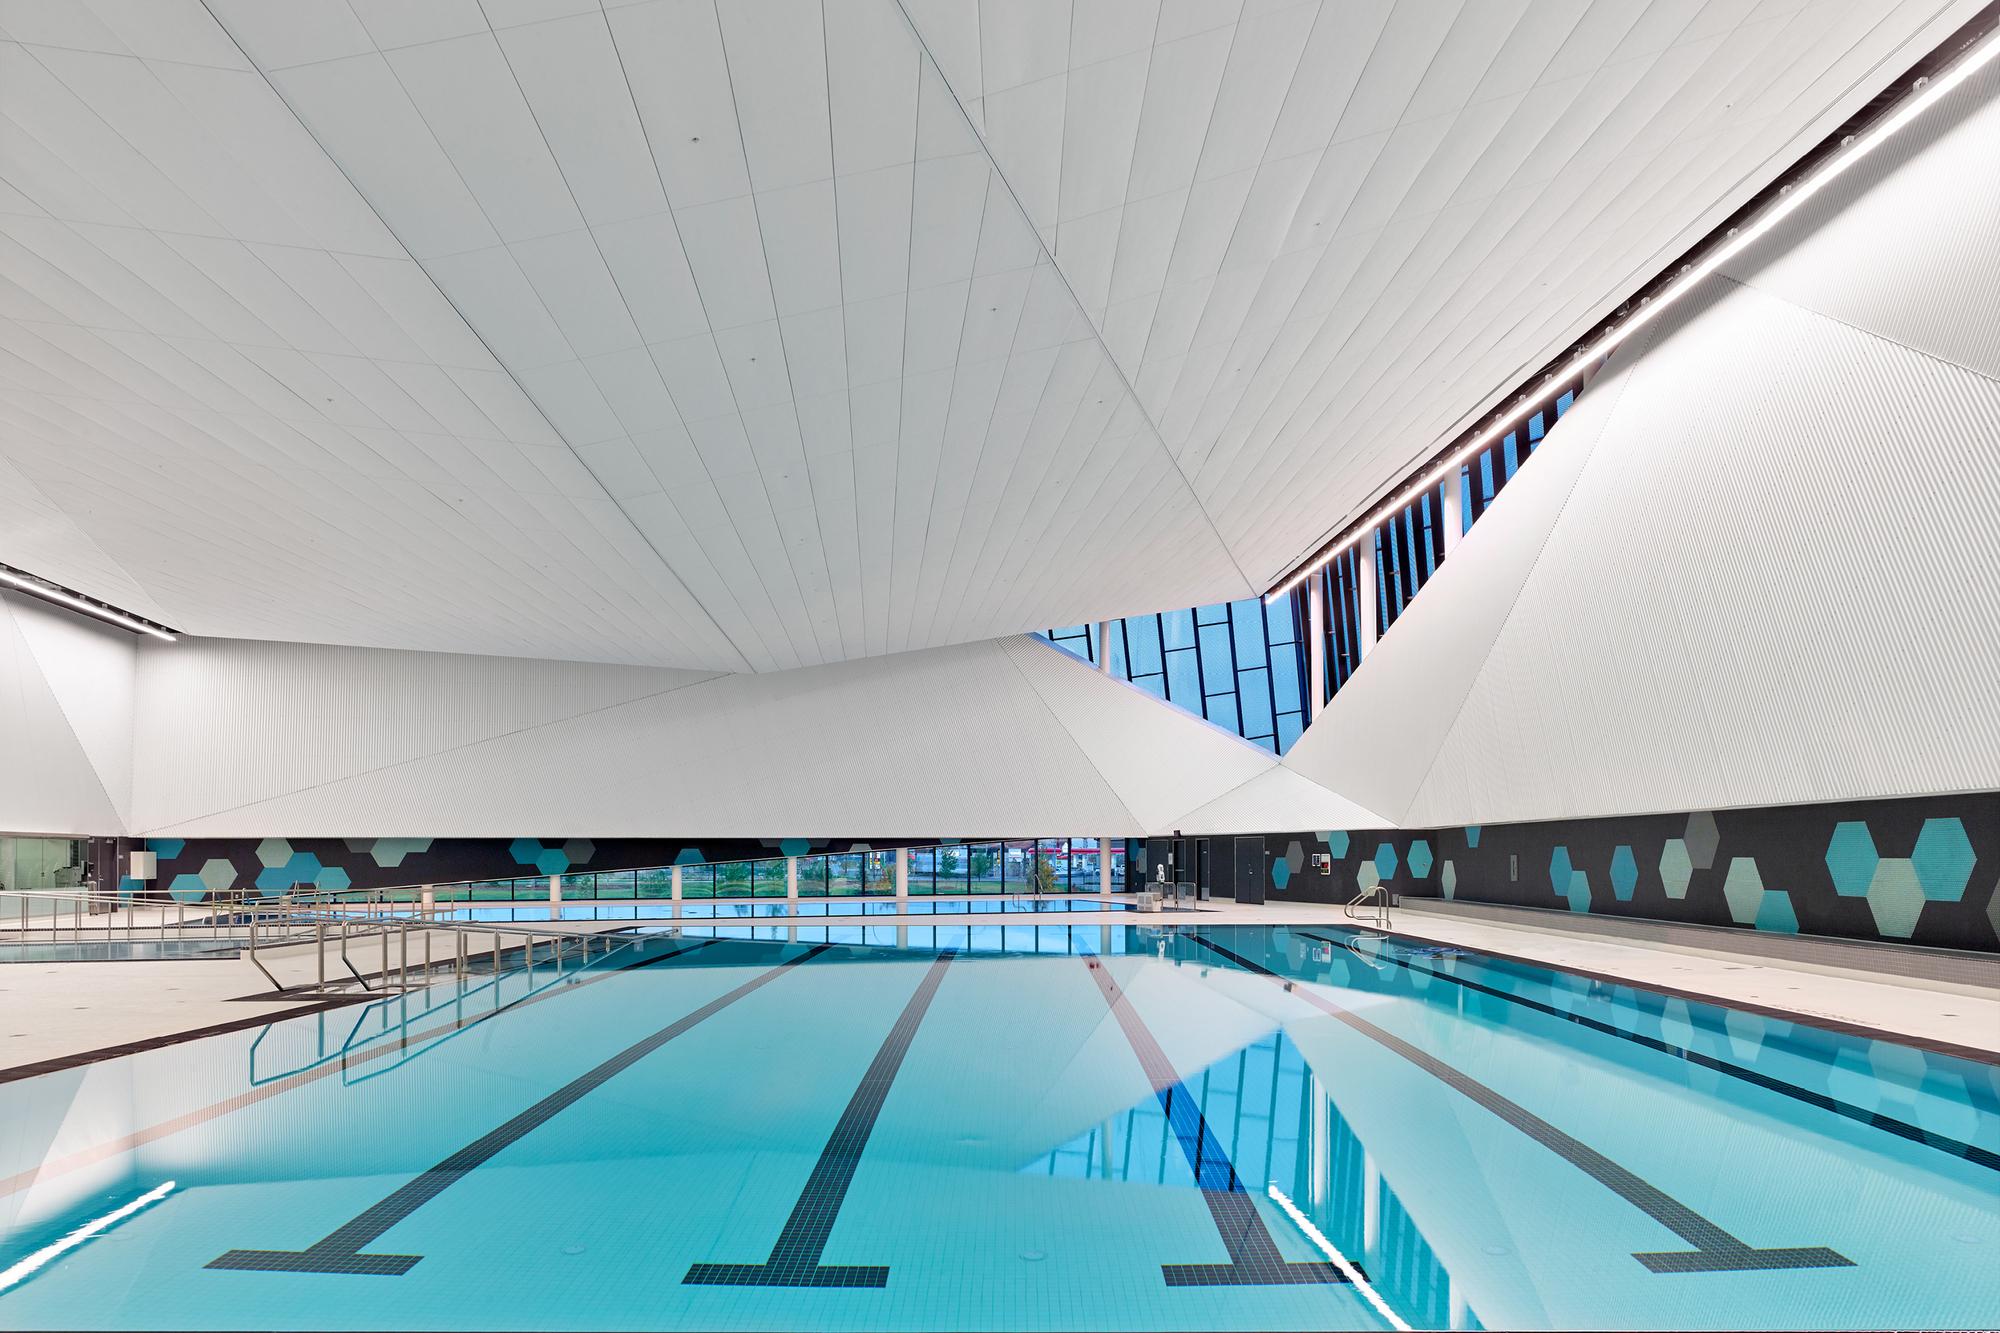 Emerald hills leisure centre mjma mta archdaily for Swimmingpool aufstellbecken pool